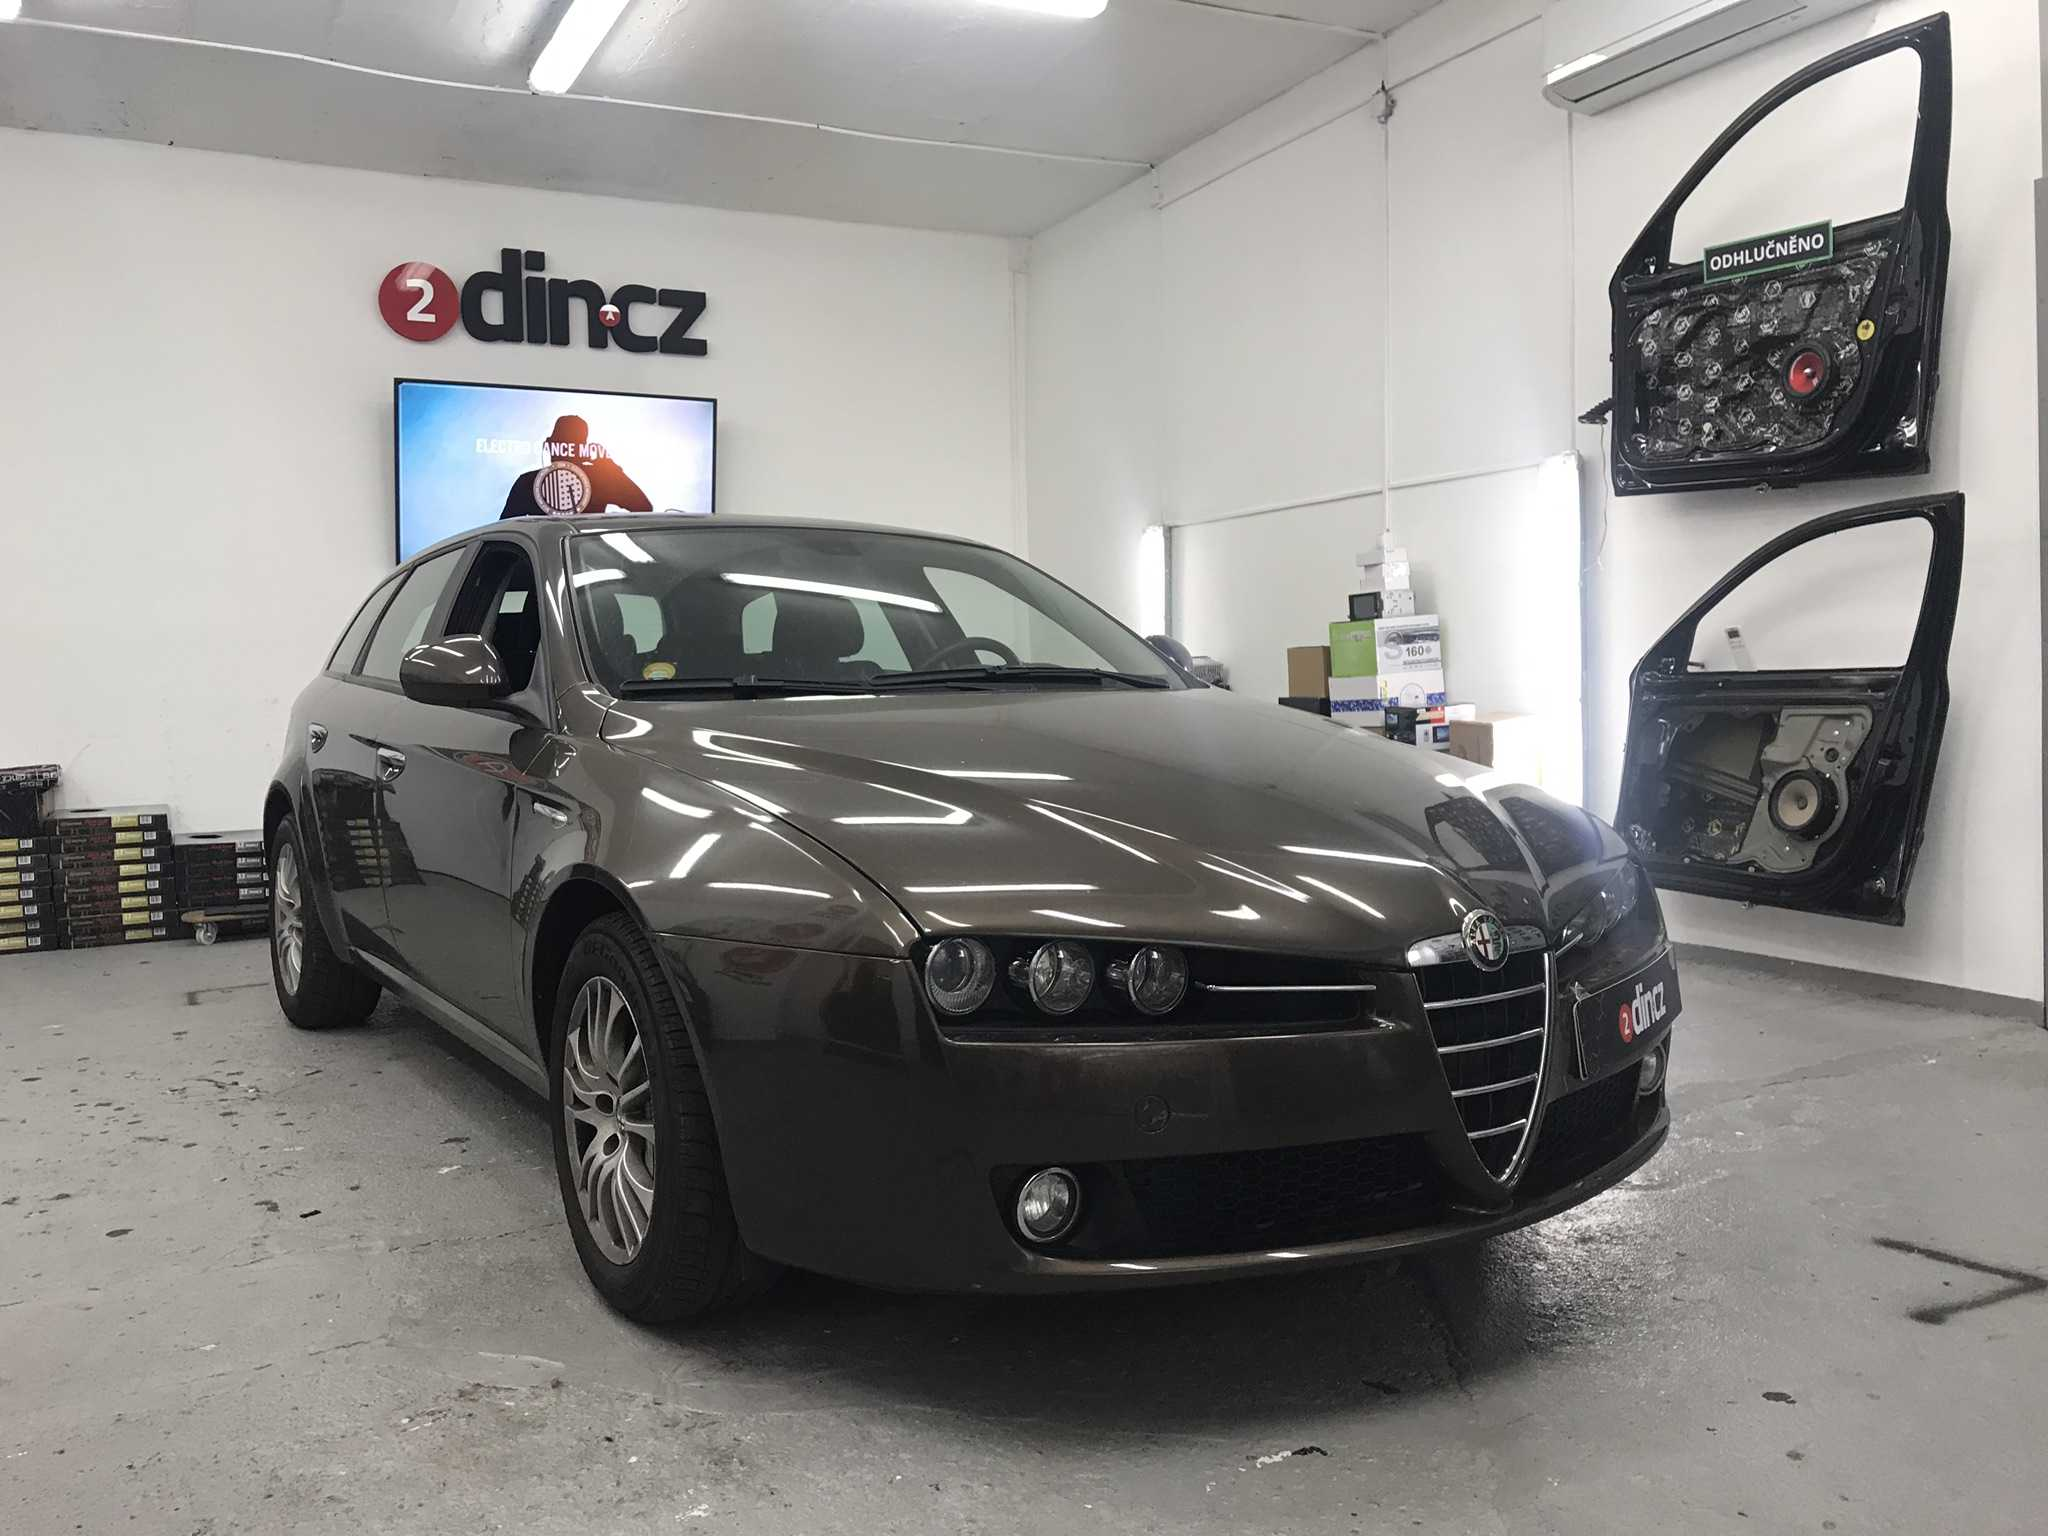 Alfa Romeo 159 - Montáž 2din autorádia s GPS